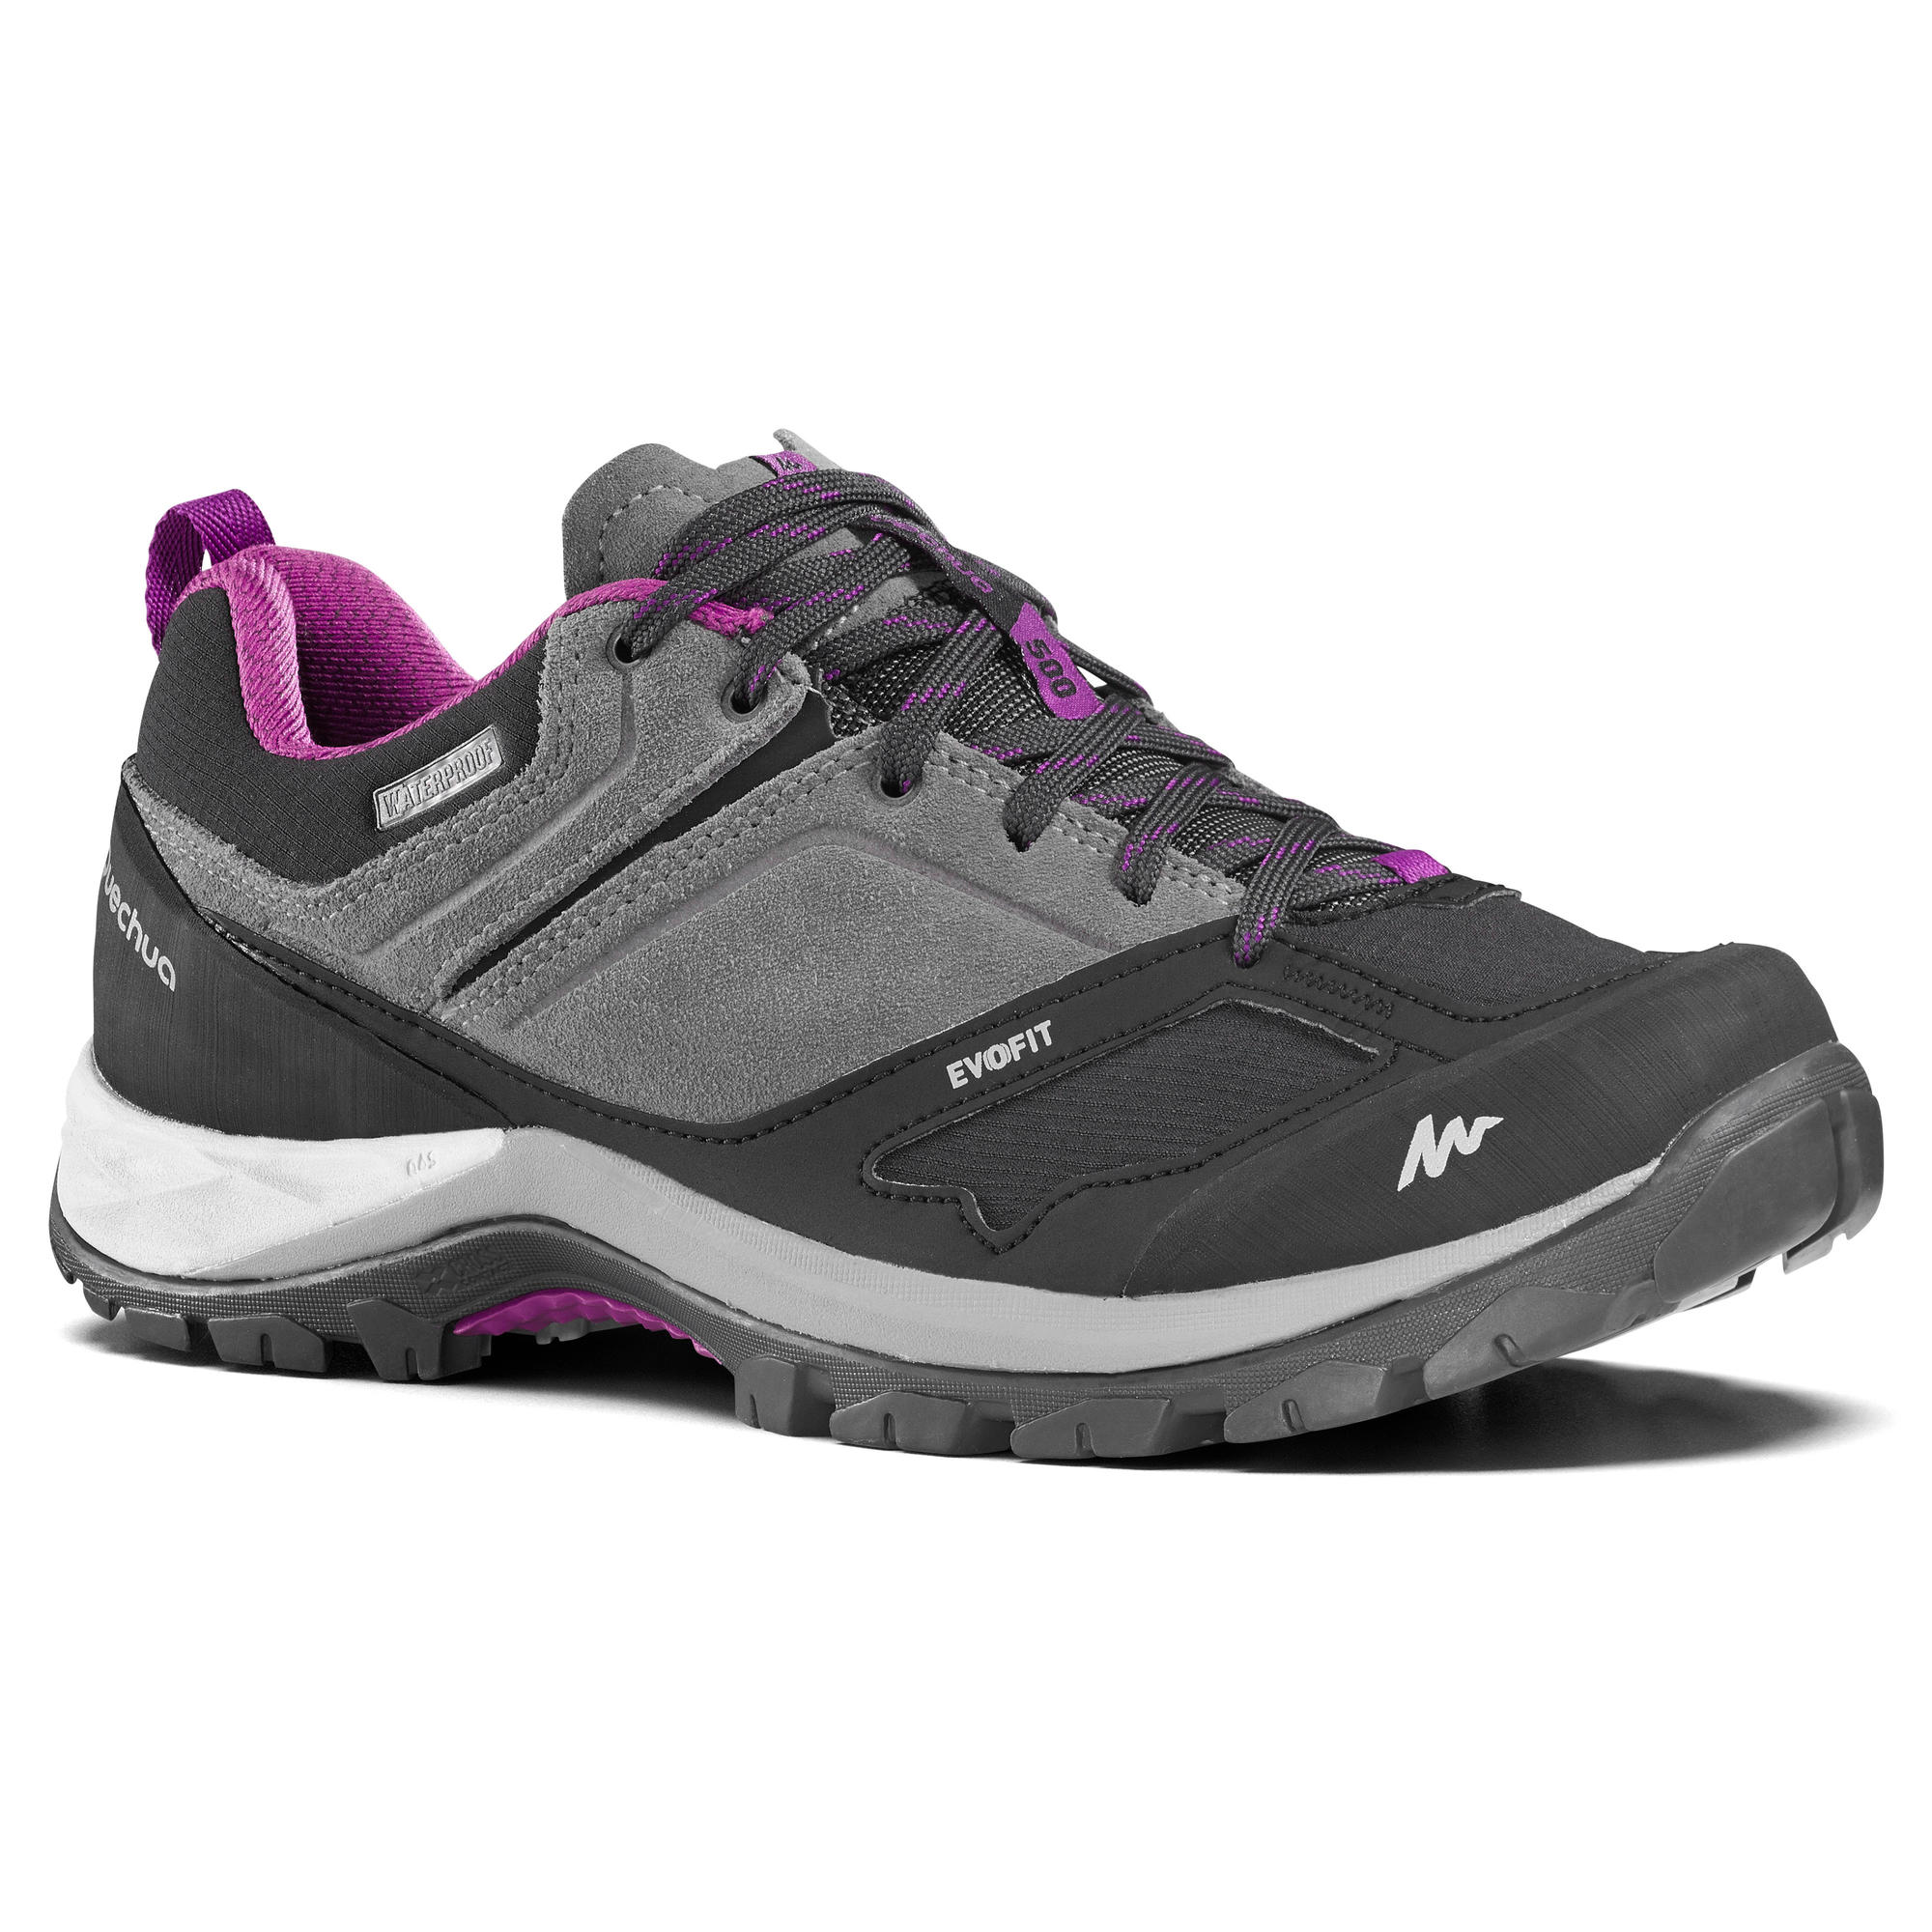 MH500 Waterproof Hiking Boots